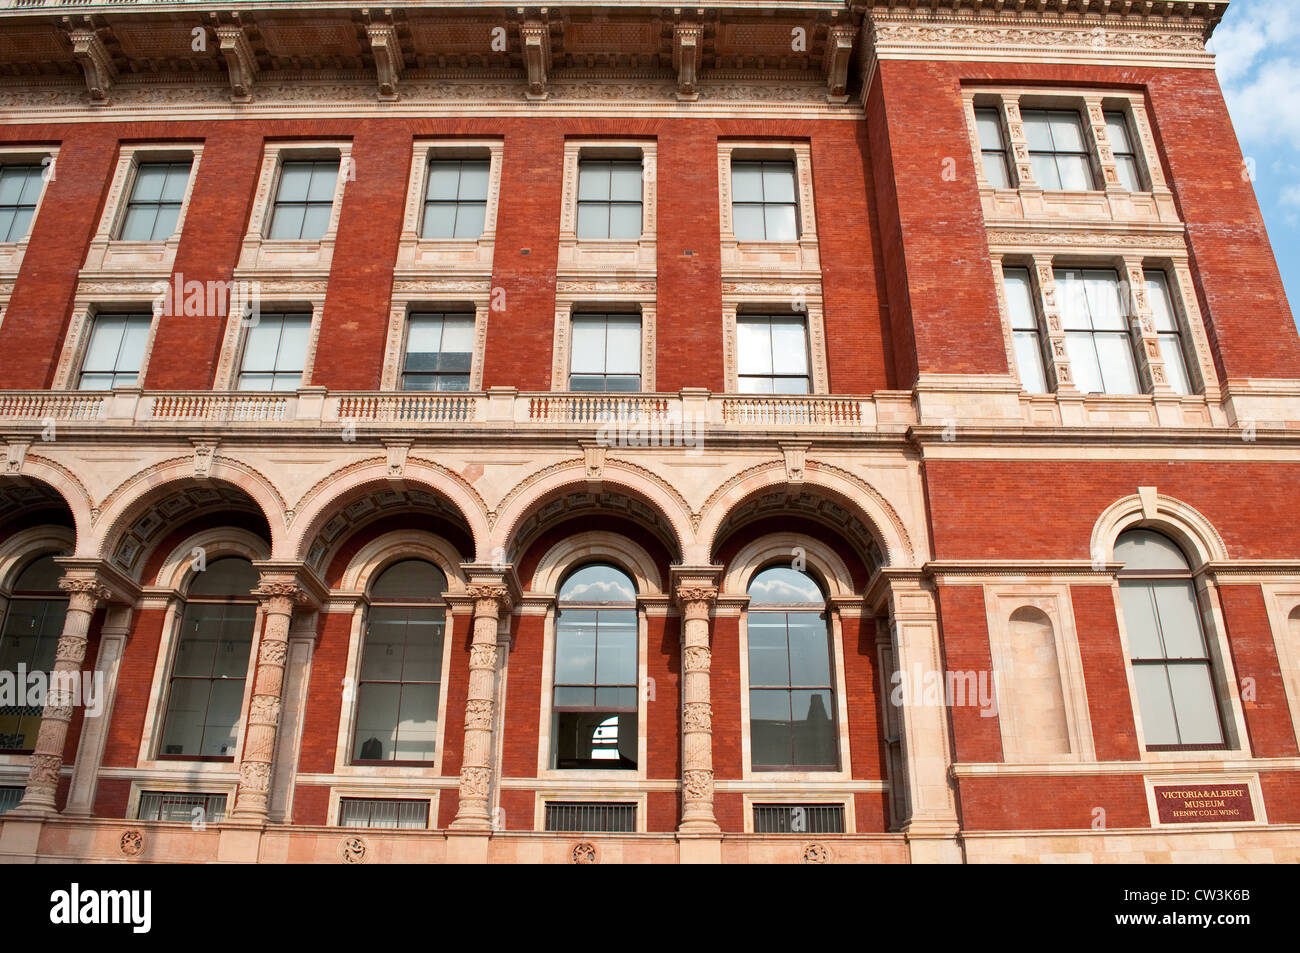 Victoria & Albert Museum, Henry Cole Wing, Exhibition Road, South Kensington, London, UK - Stock Image